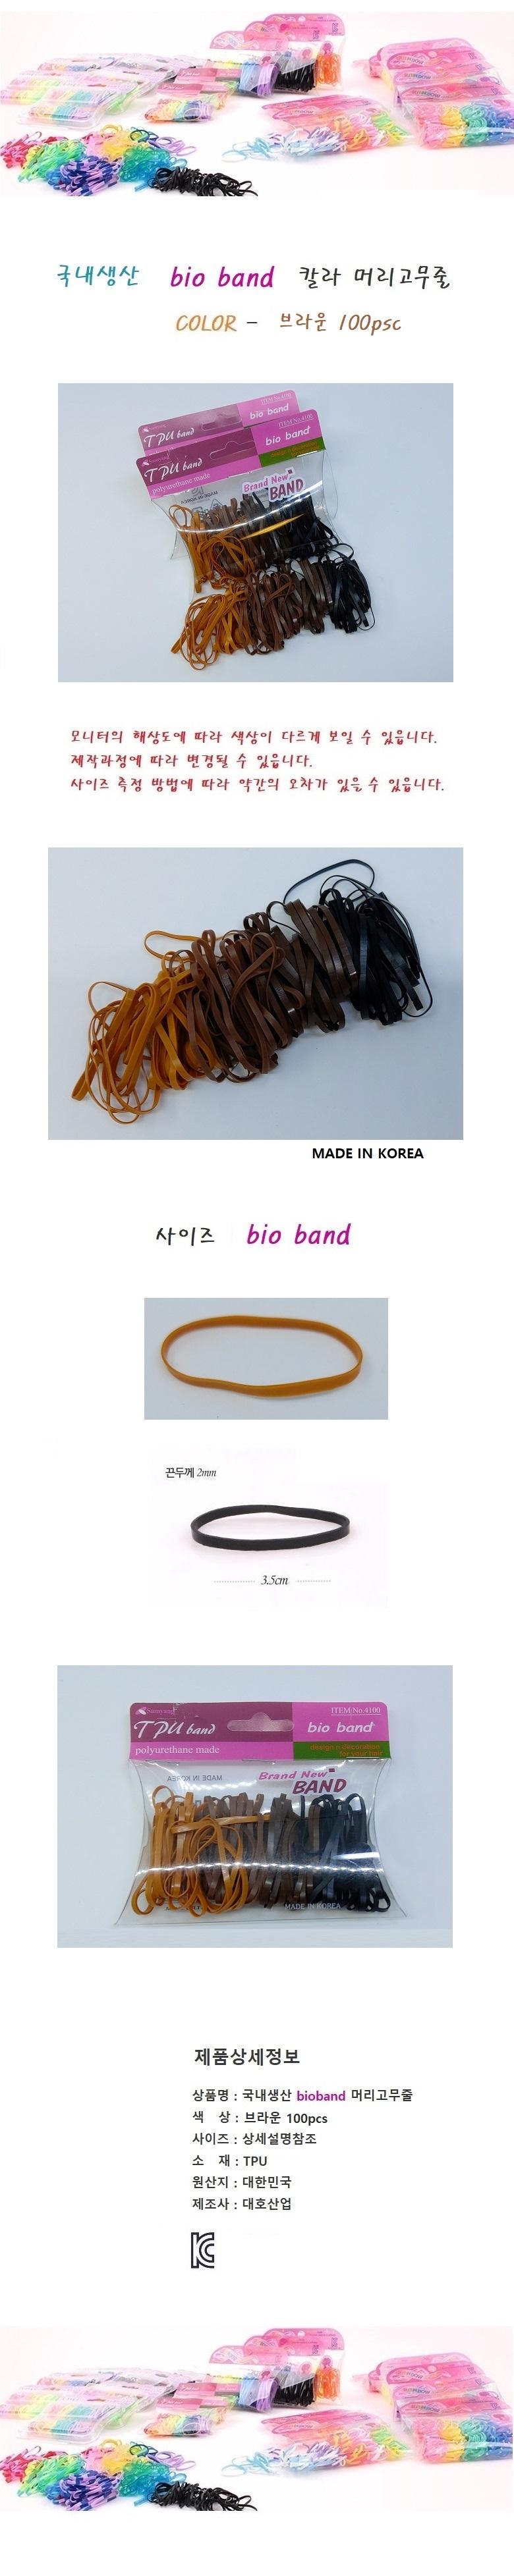 bioband_brown.jpg